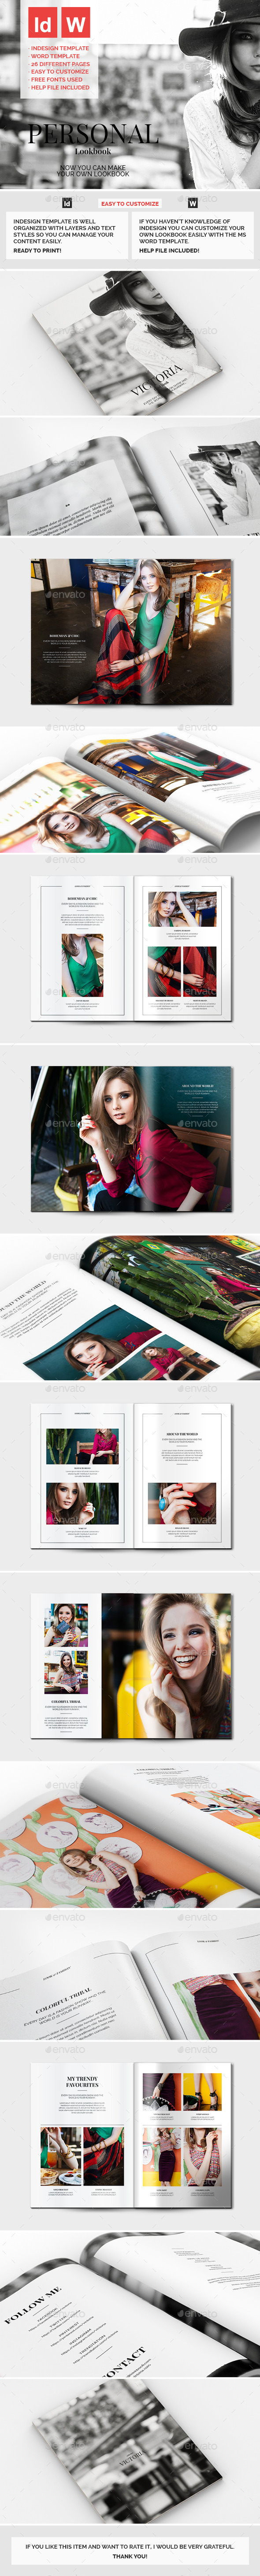 GraphicRiver Personal Lookbook 9529612